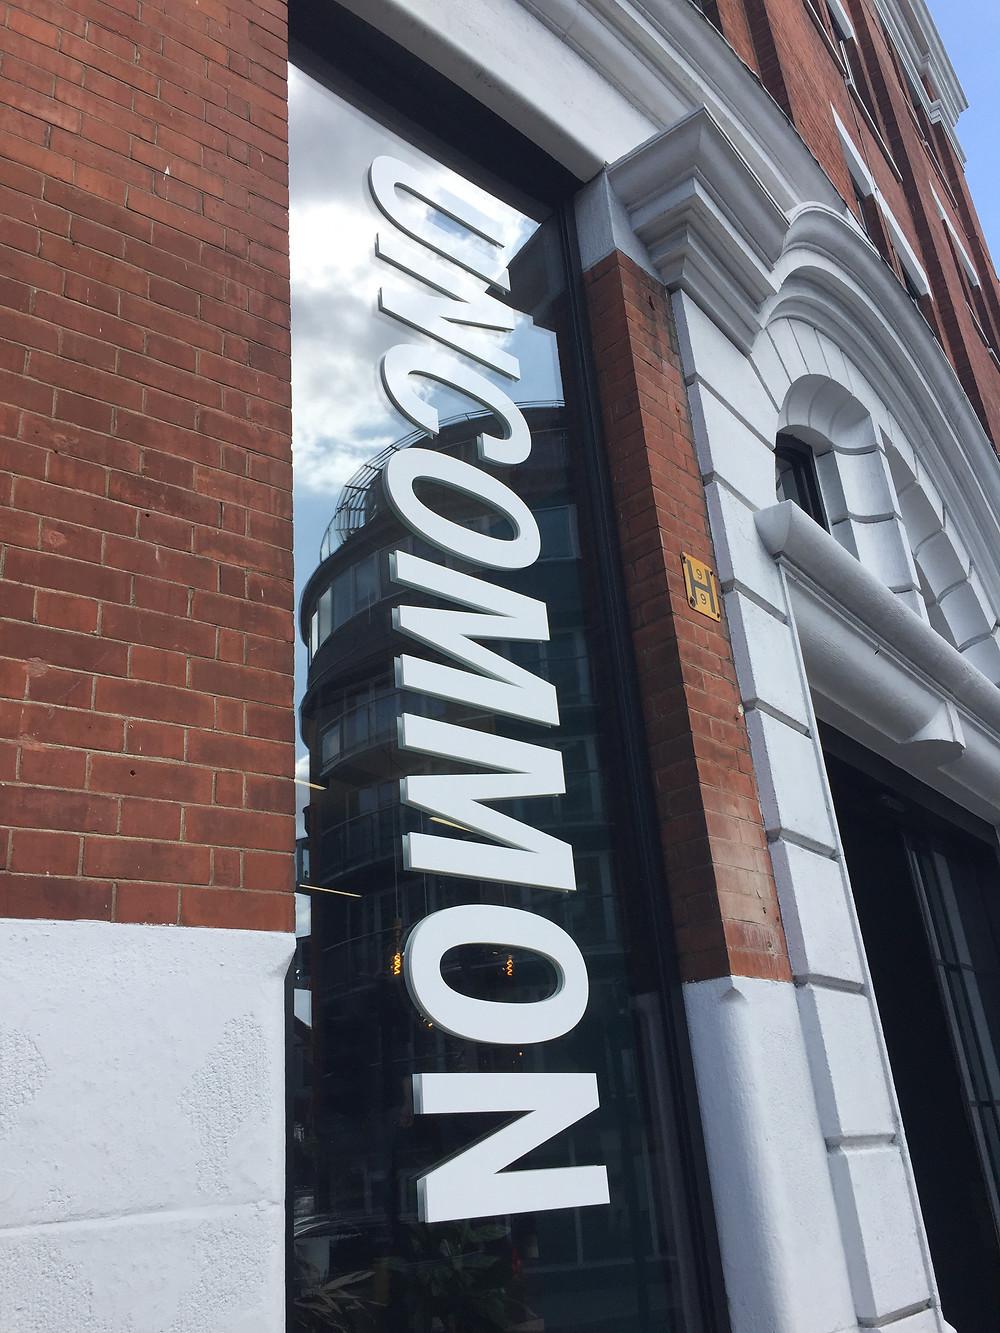 Uncommon Borough London work space